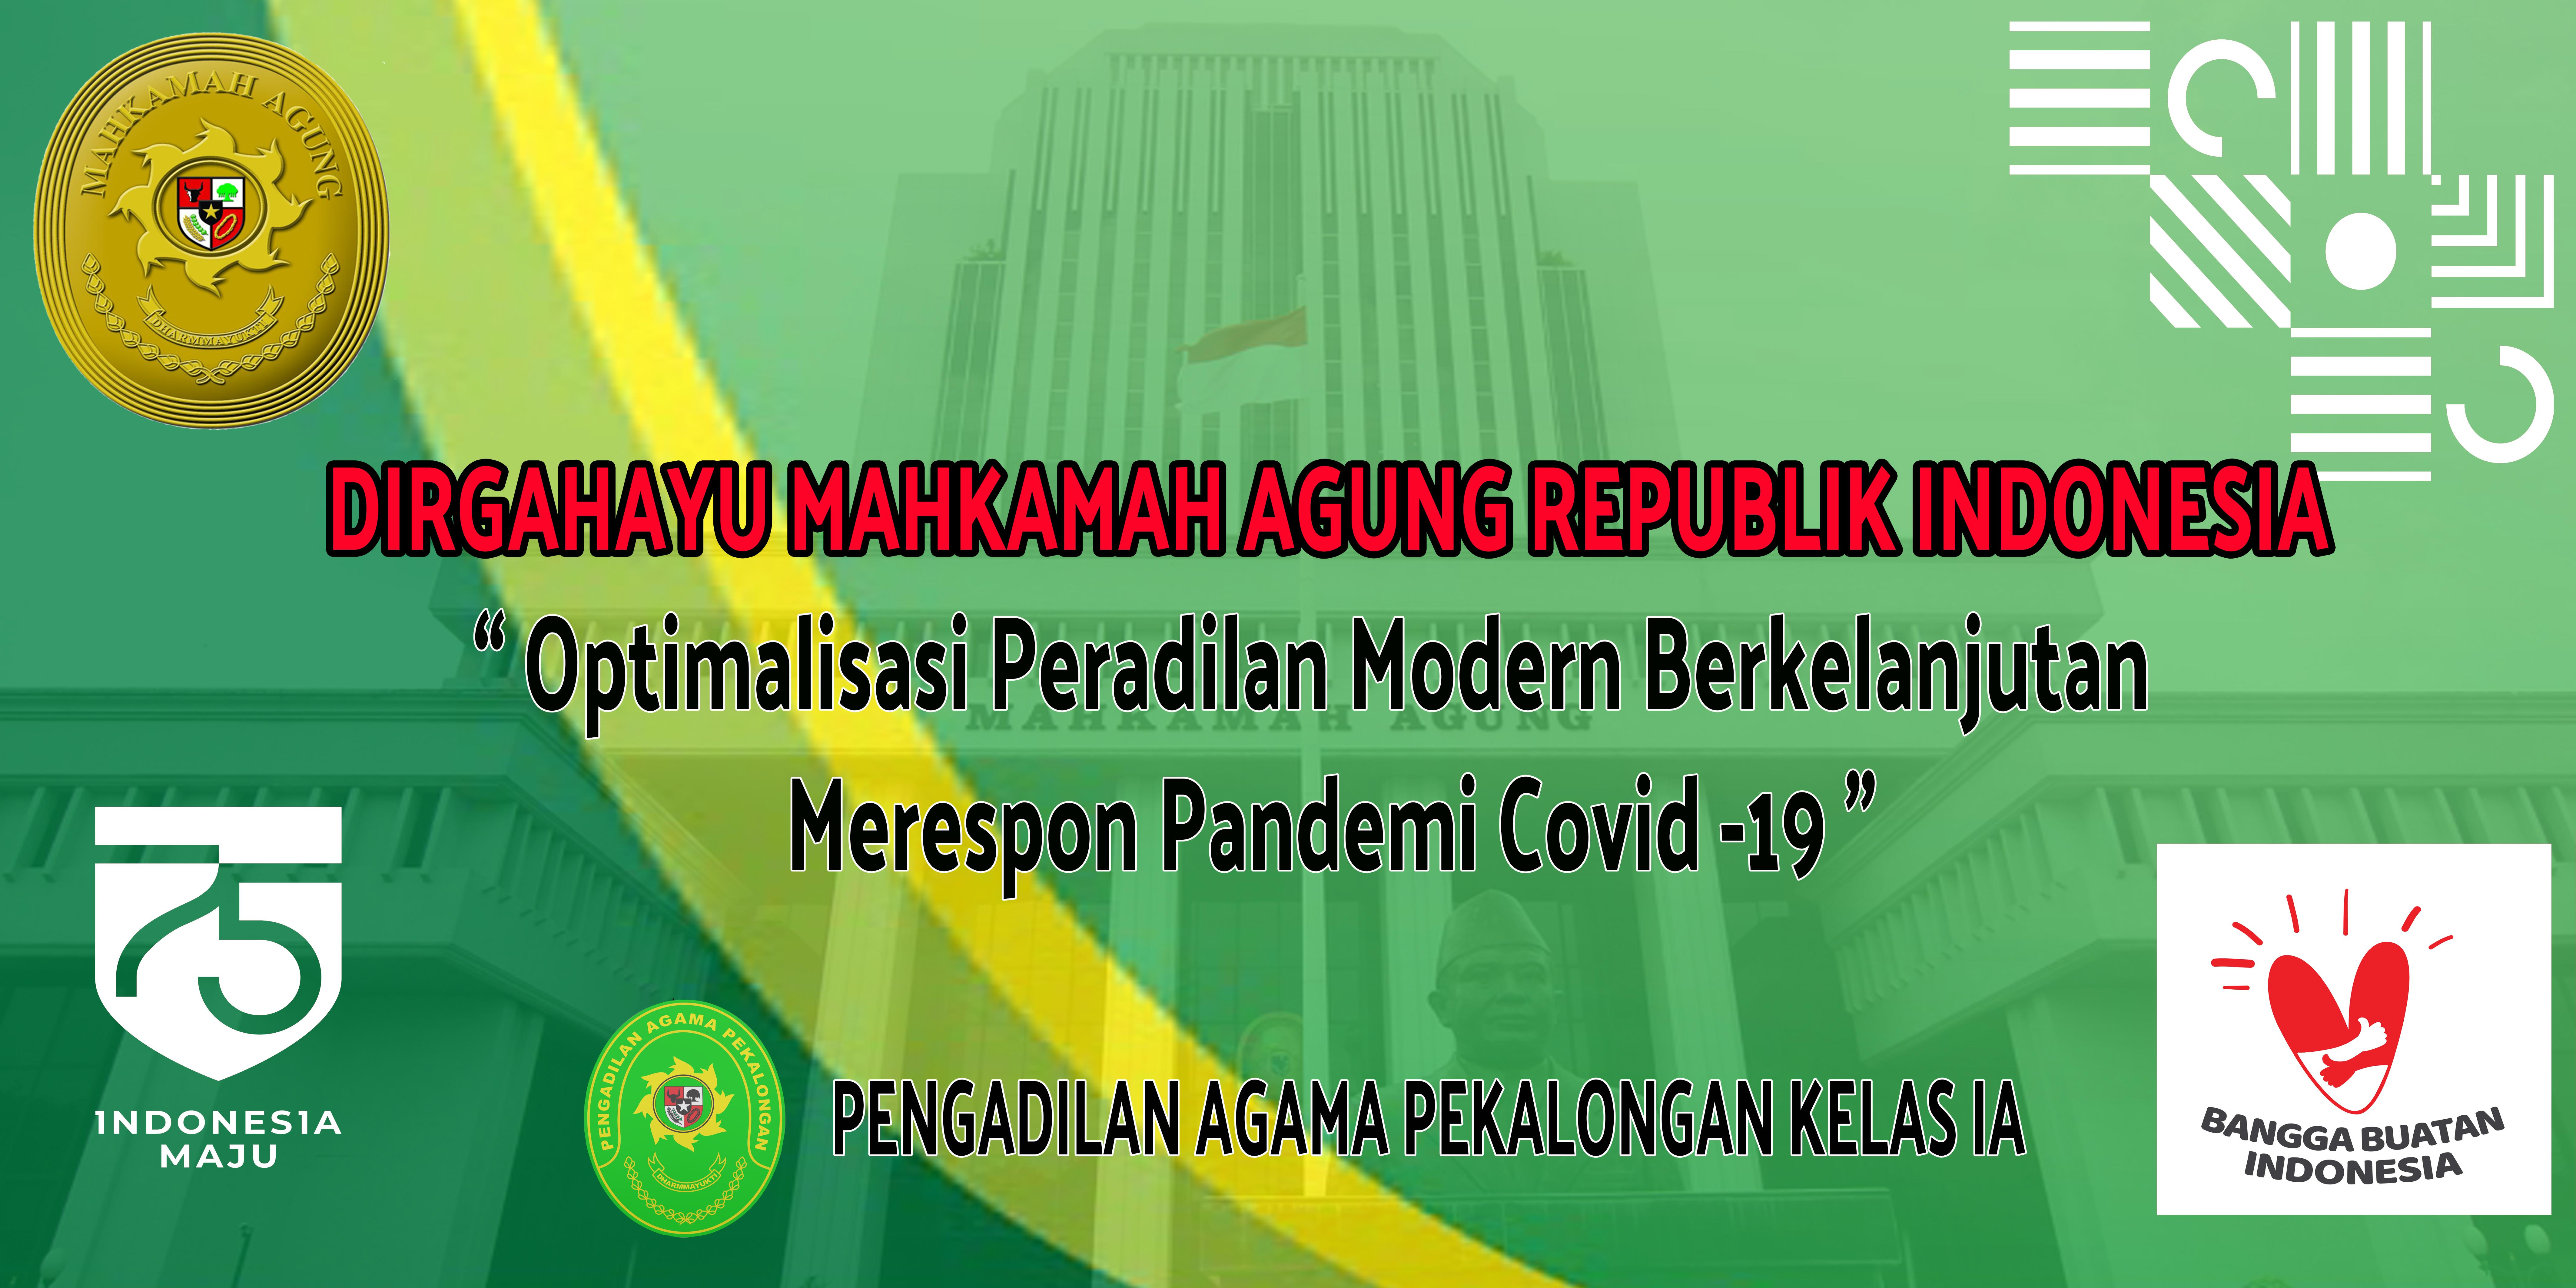 DIRGAHAYU MAHKAMAH AGUNG REPUBLIK INDONESIA KE 75